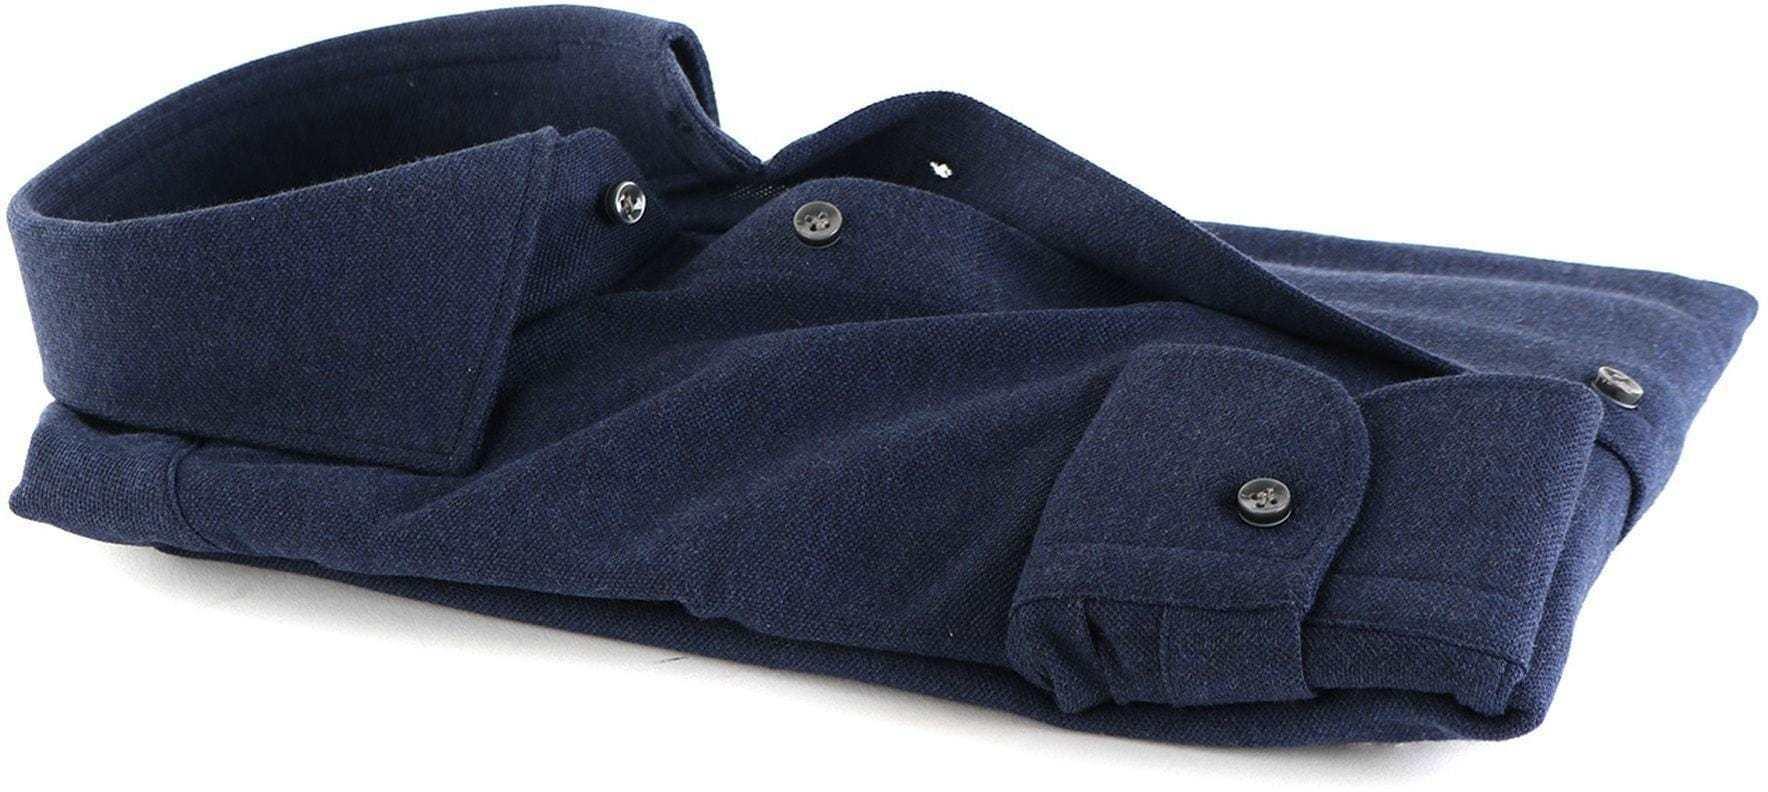 Profuomo Shirt Knitted Dark Blue foto 2